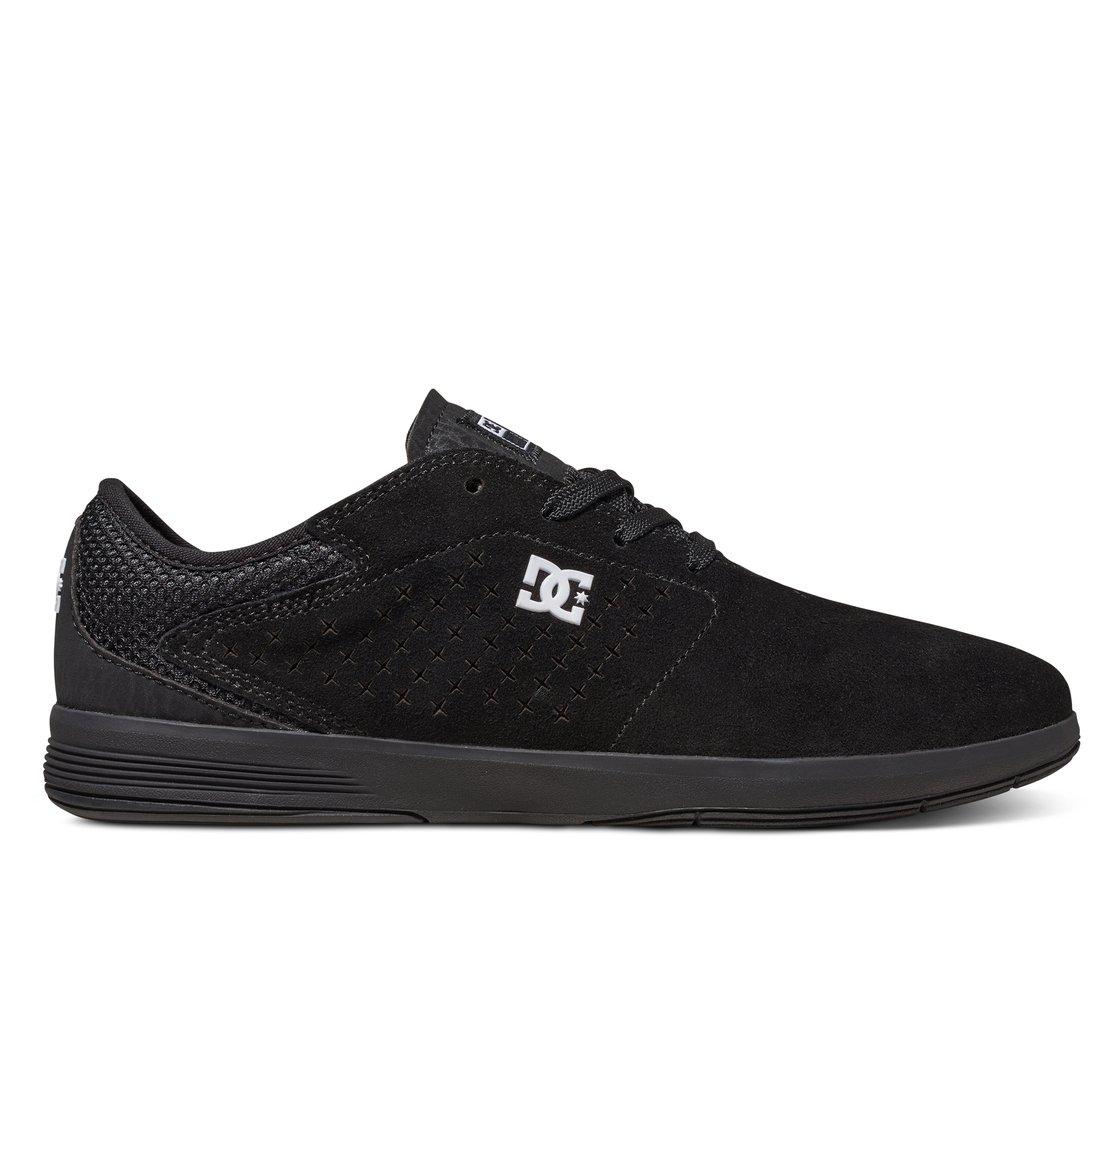 Skate shoes pictures - 0 Men S New Jack S Skate Shoes Black Adys100324 Dc Shoes